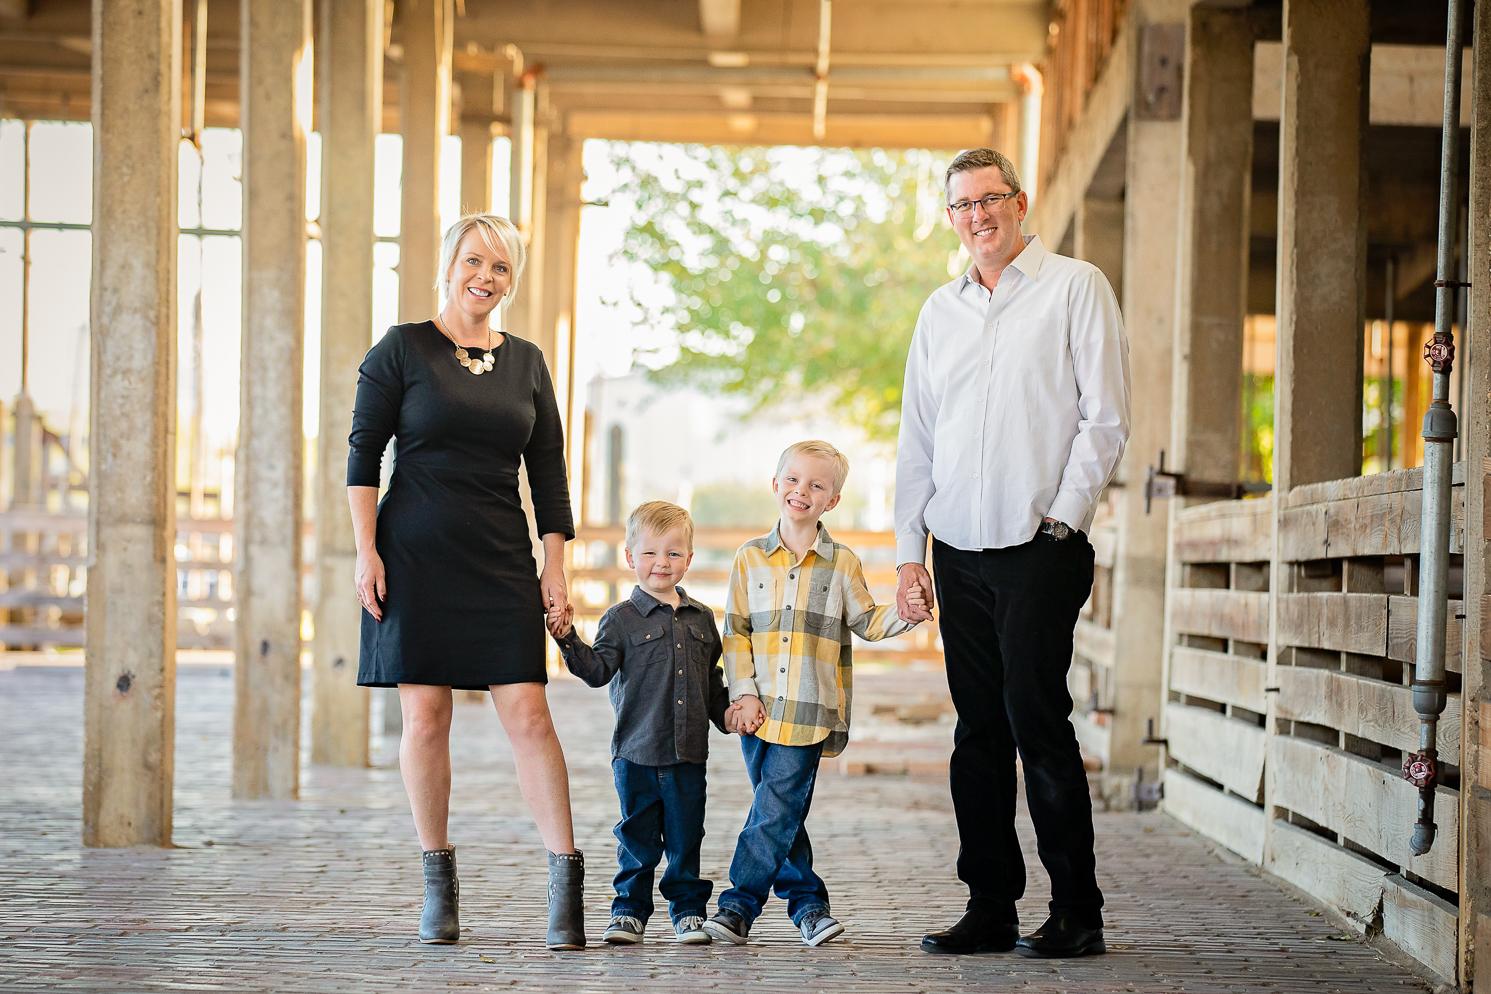 Fort Worth Stockyards Photographer